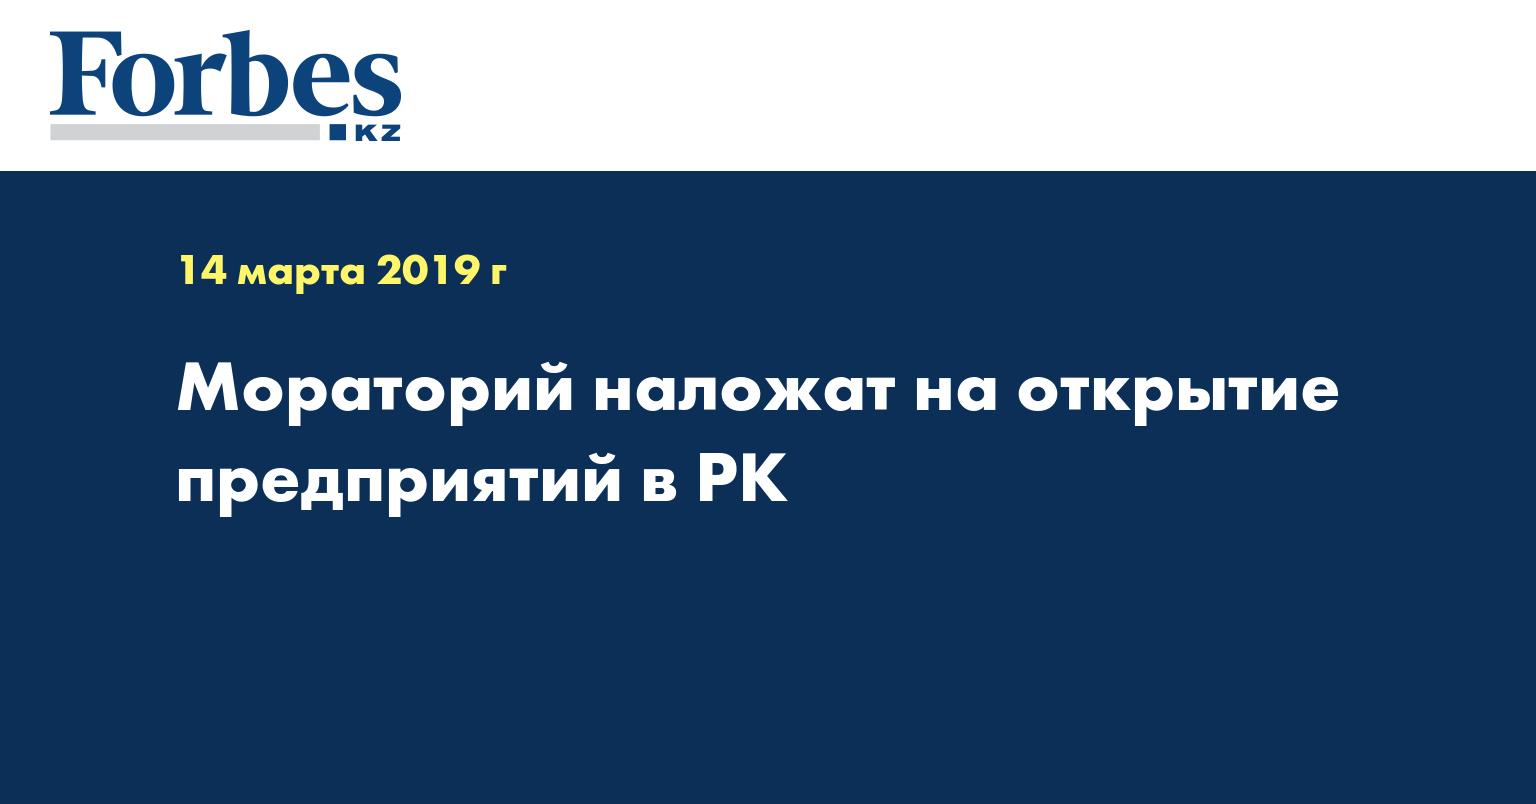 Мораторий наложат на открытие предприятий в РК